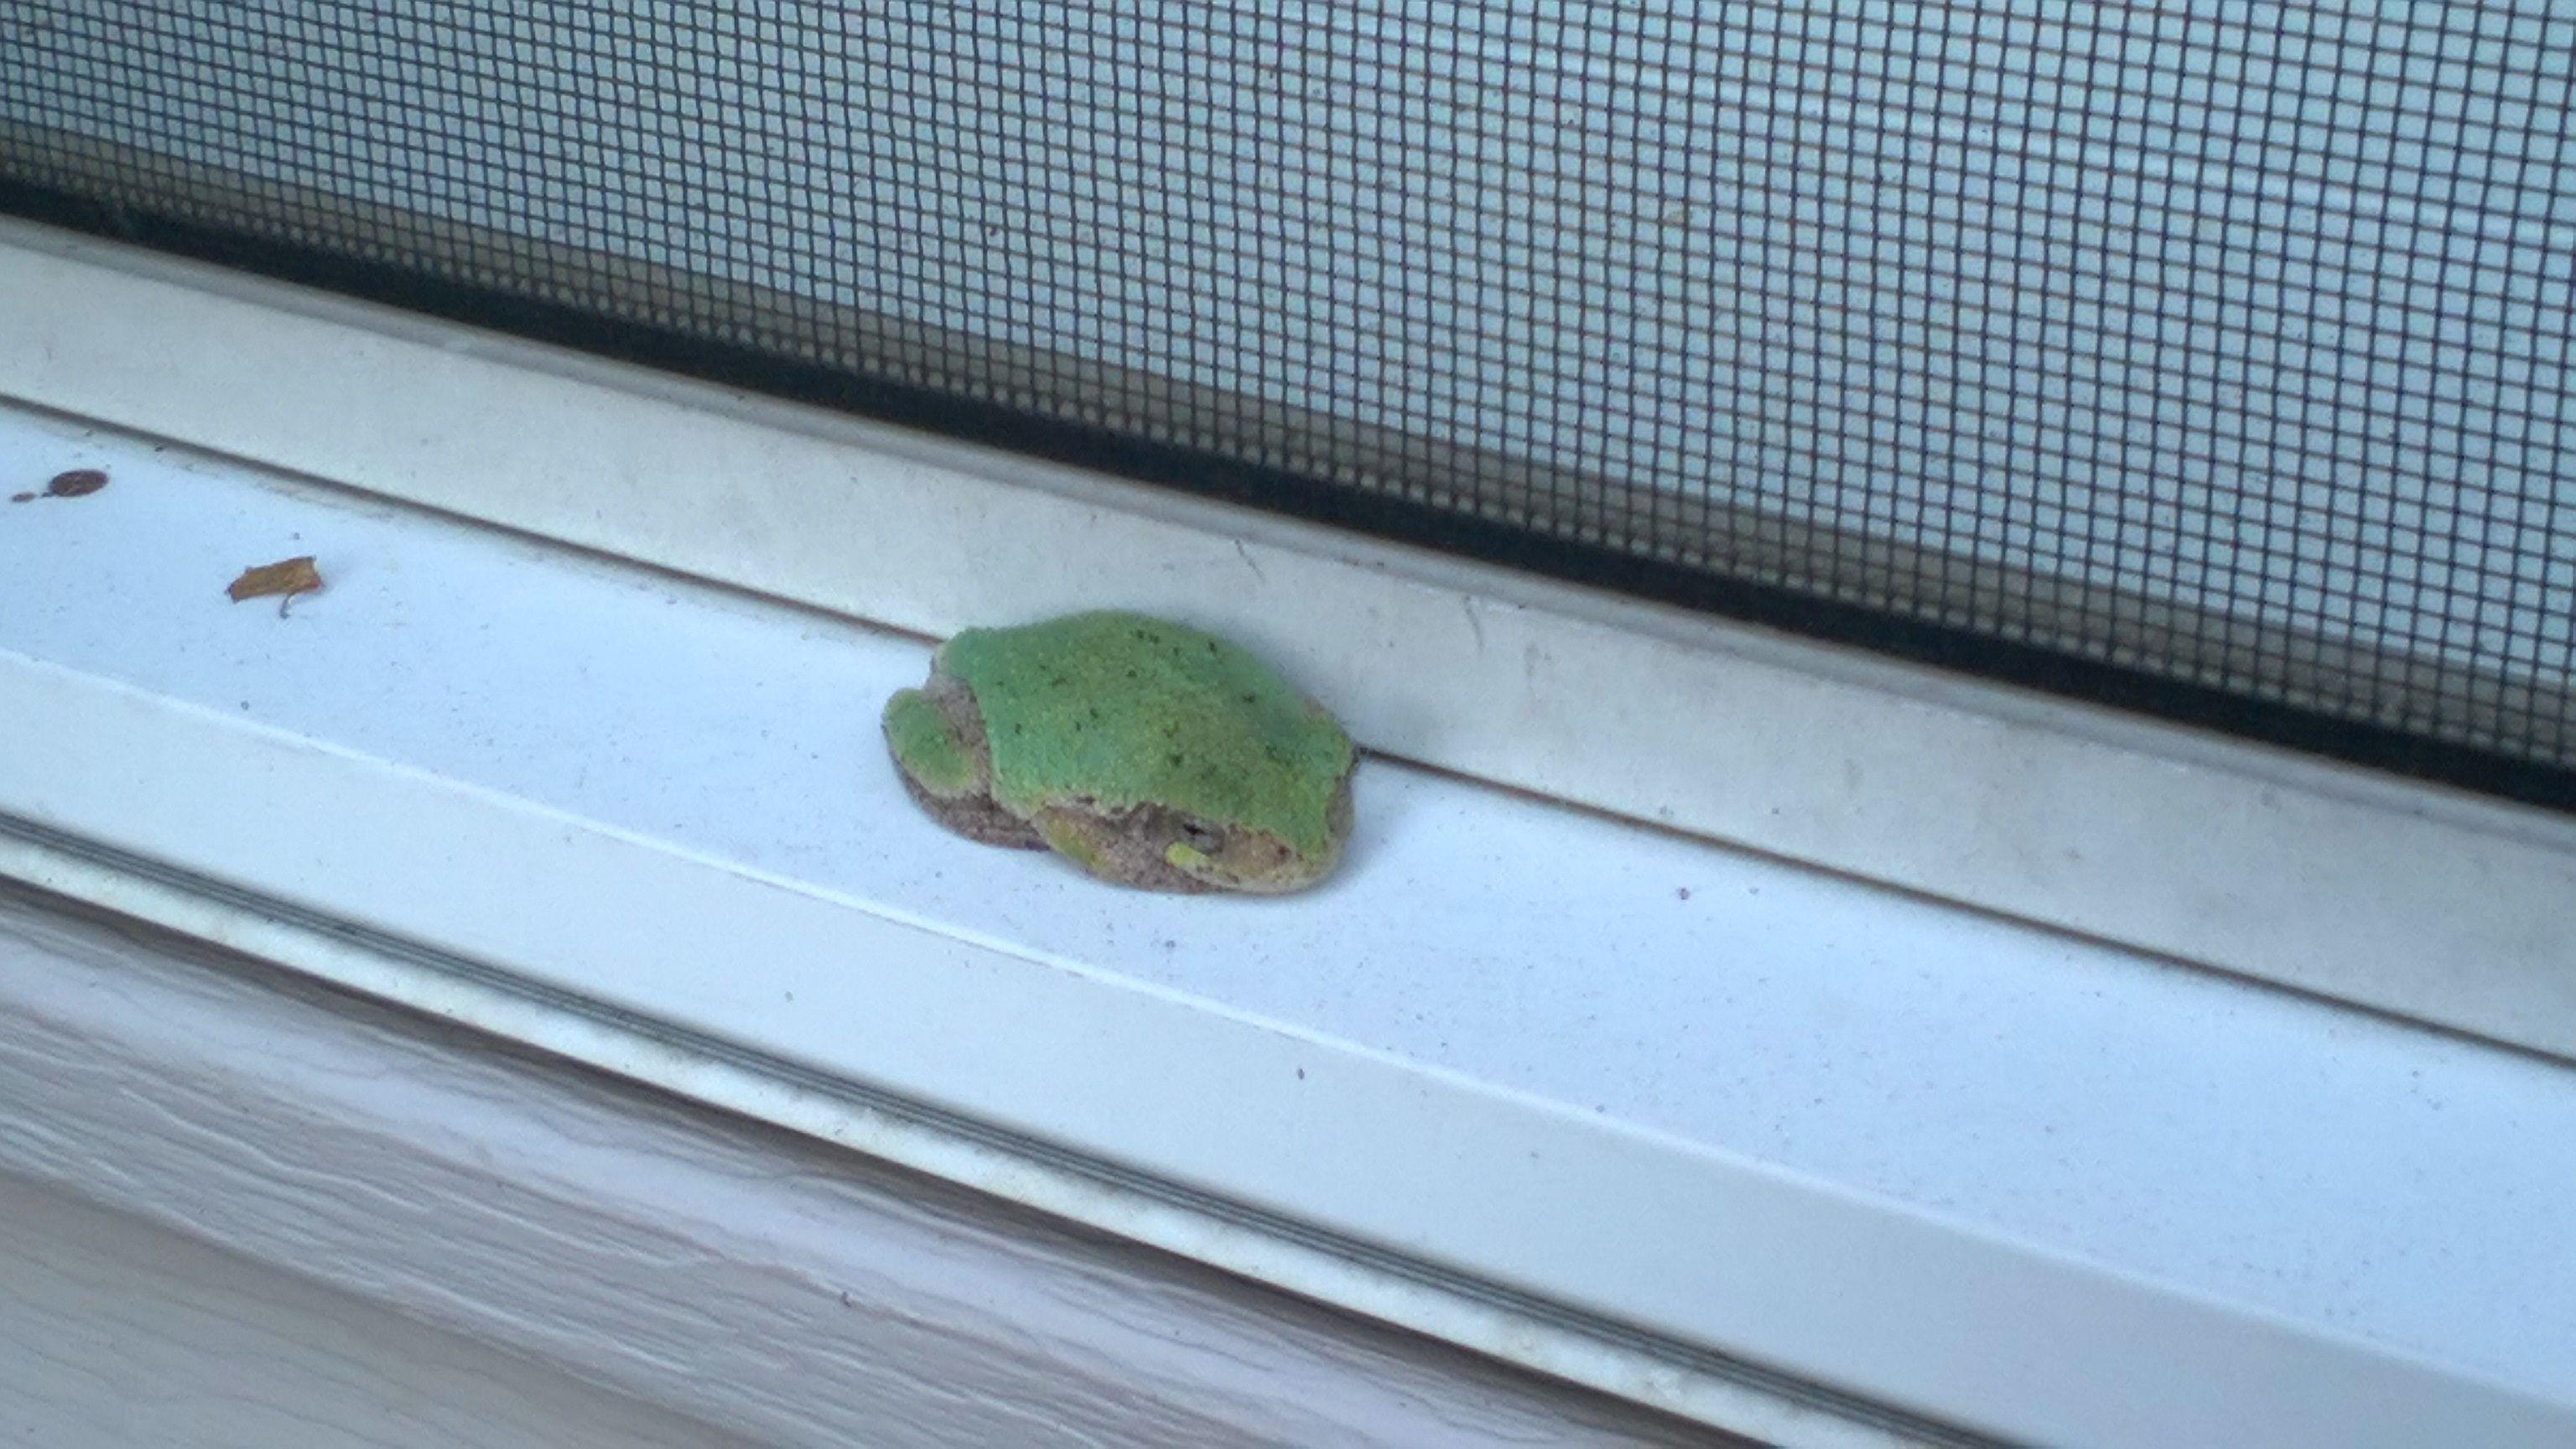 #Greytreefrog